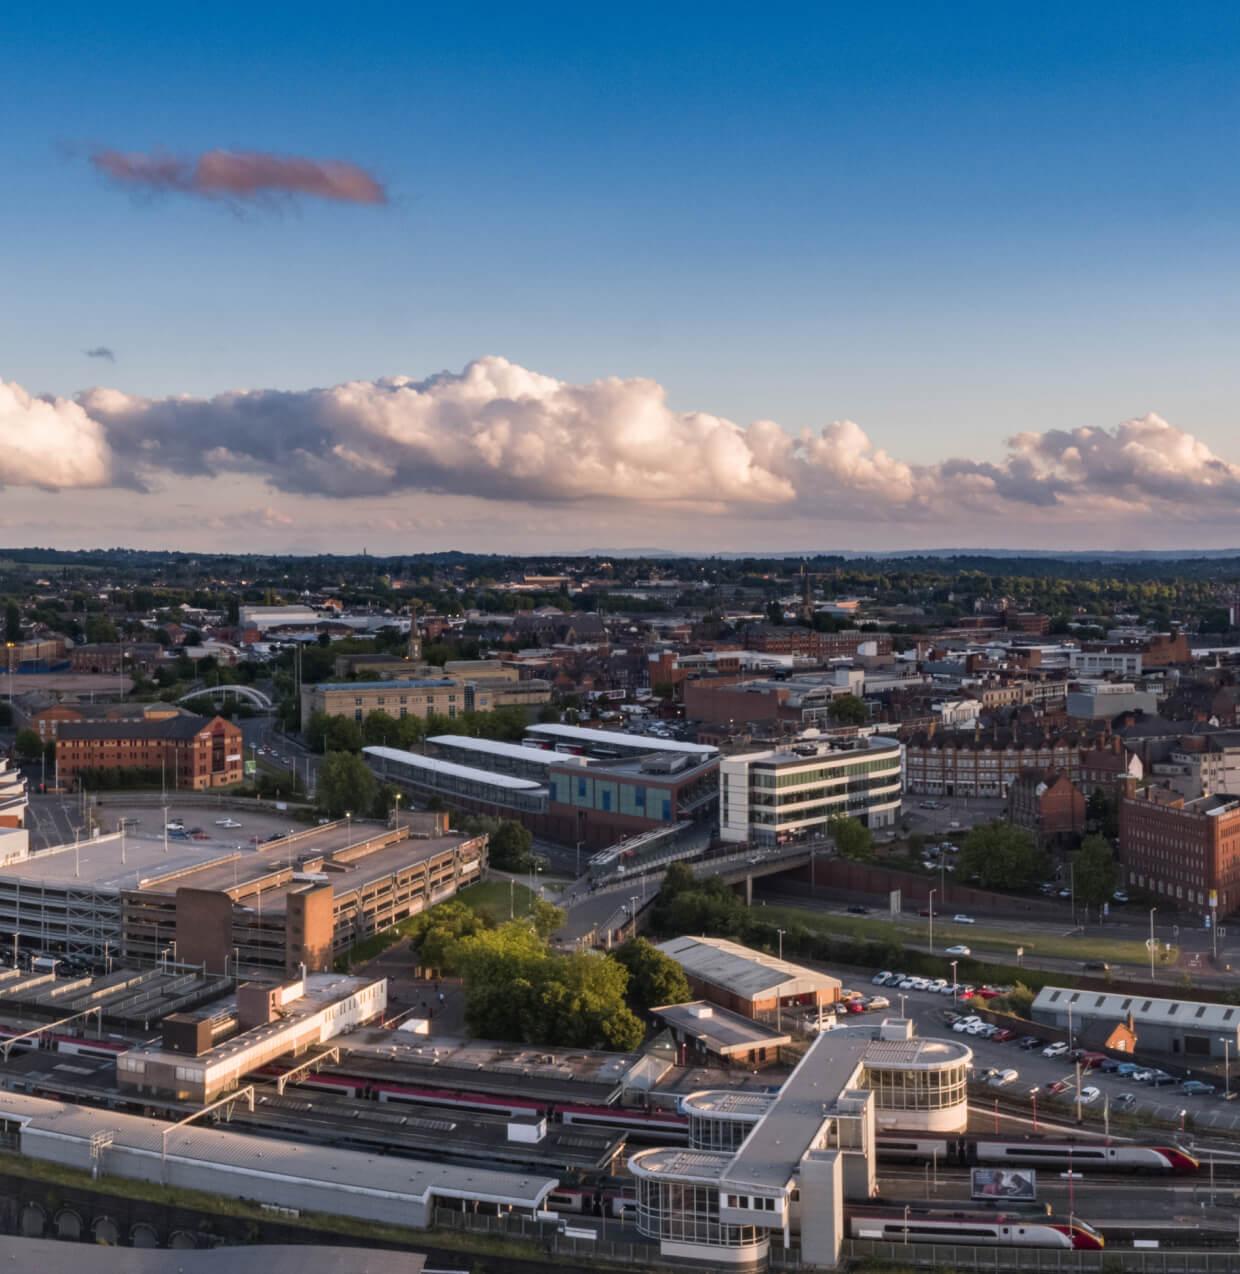 van and car hire West Midlands